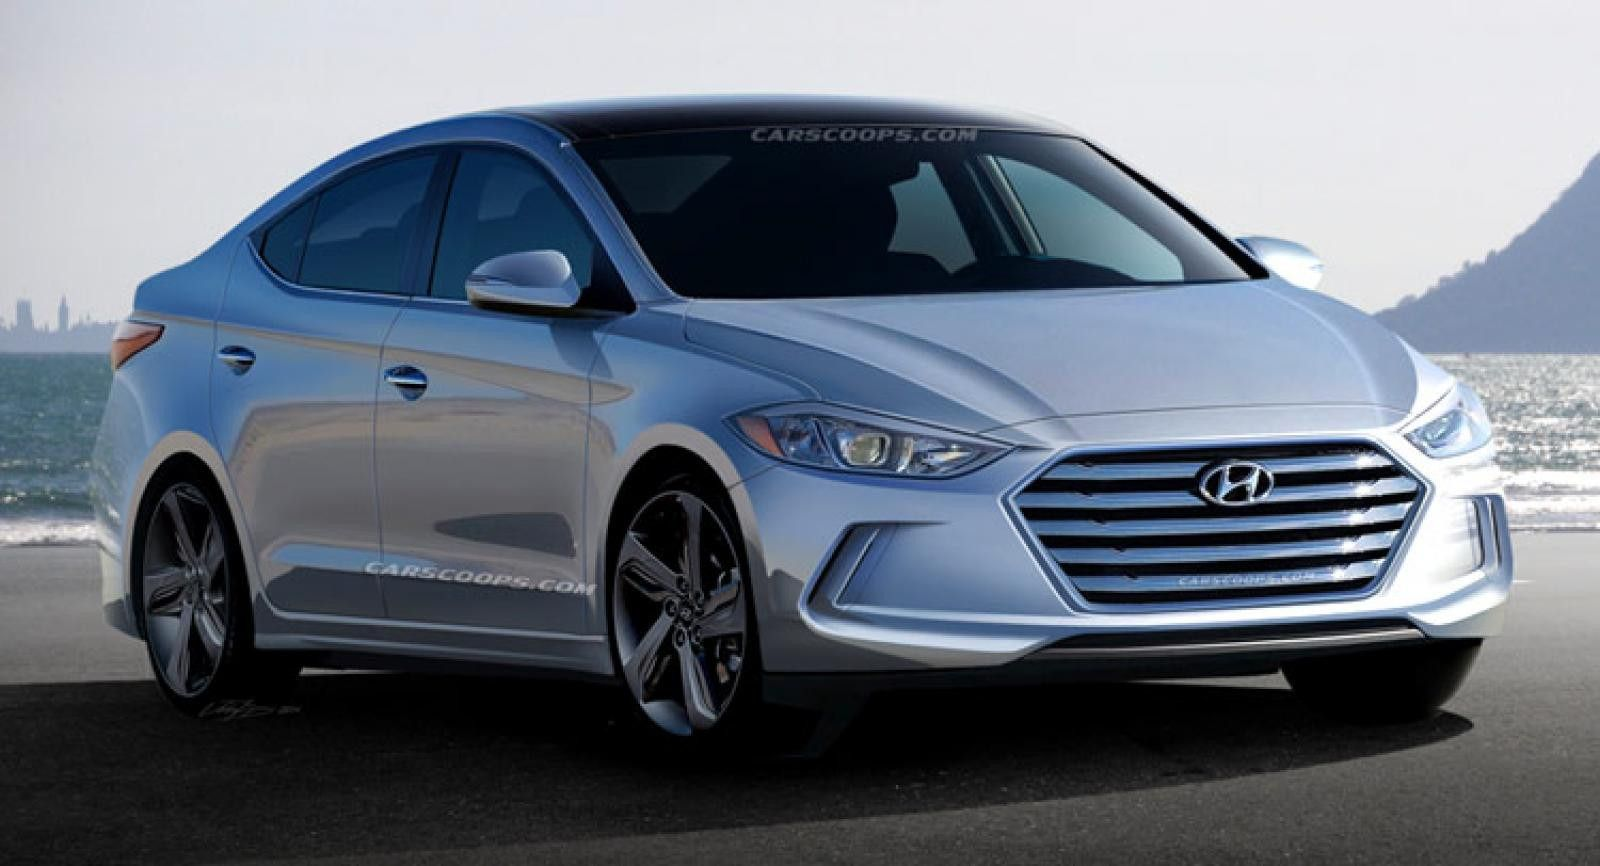 43 Elegant 2020 Genesis G80 Hyundai elantra